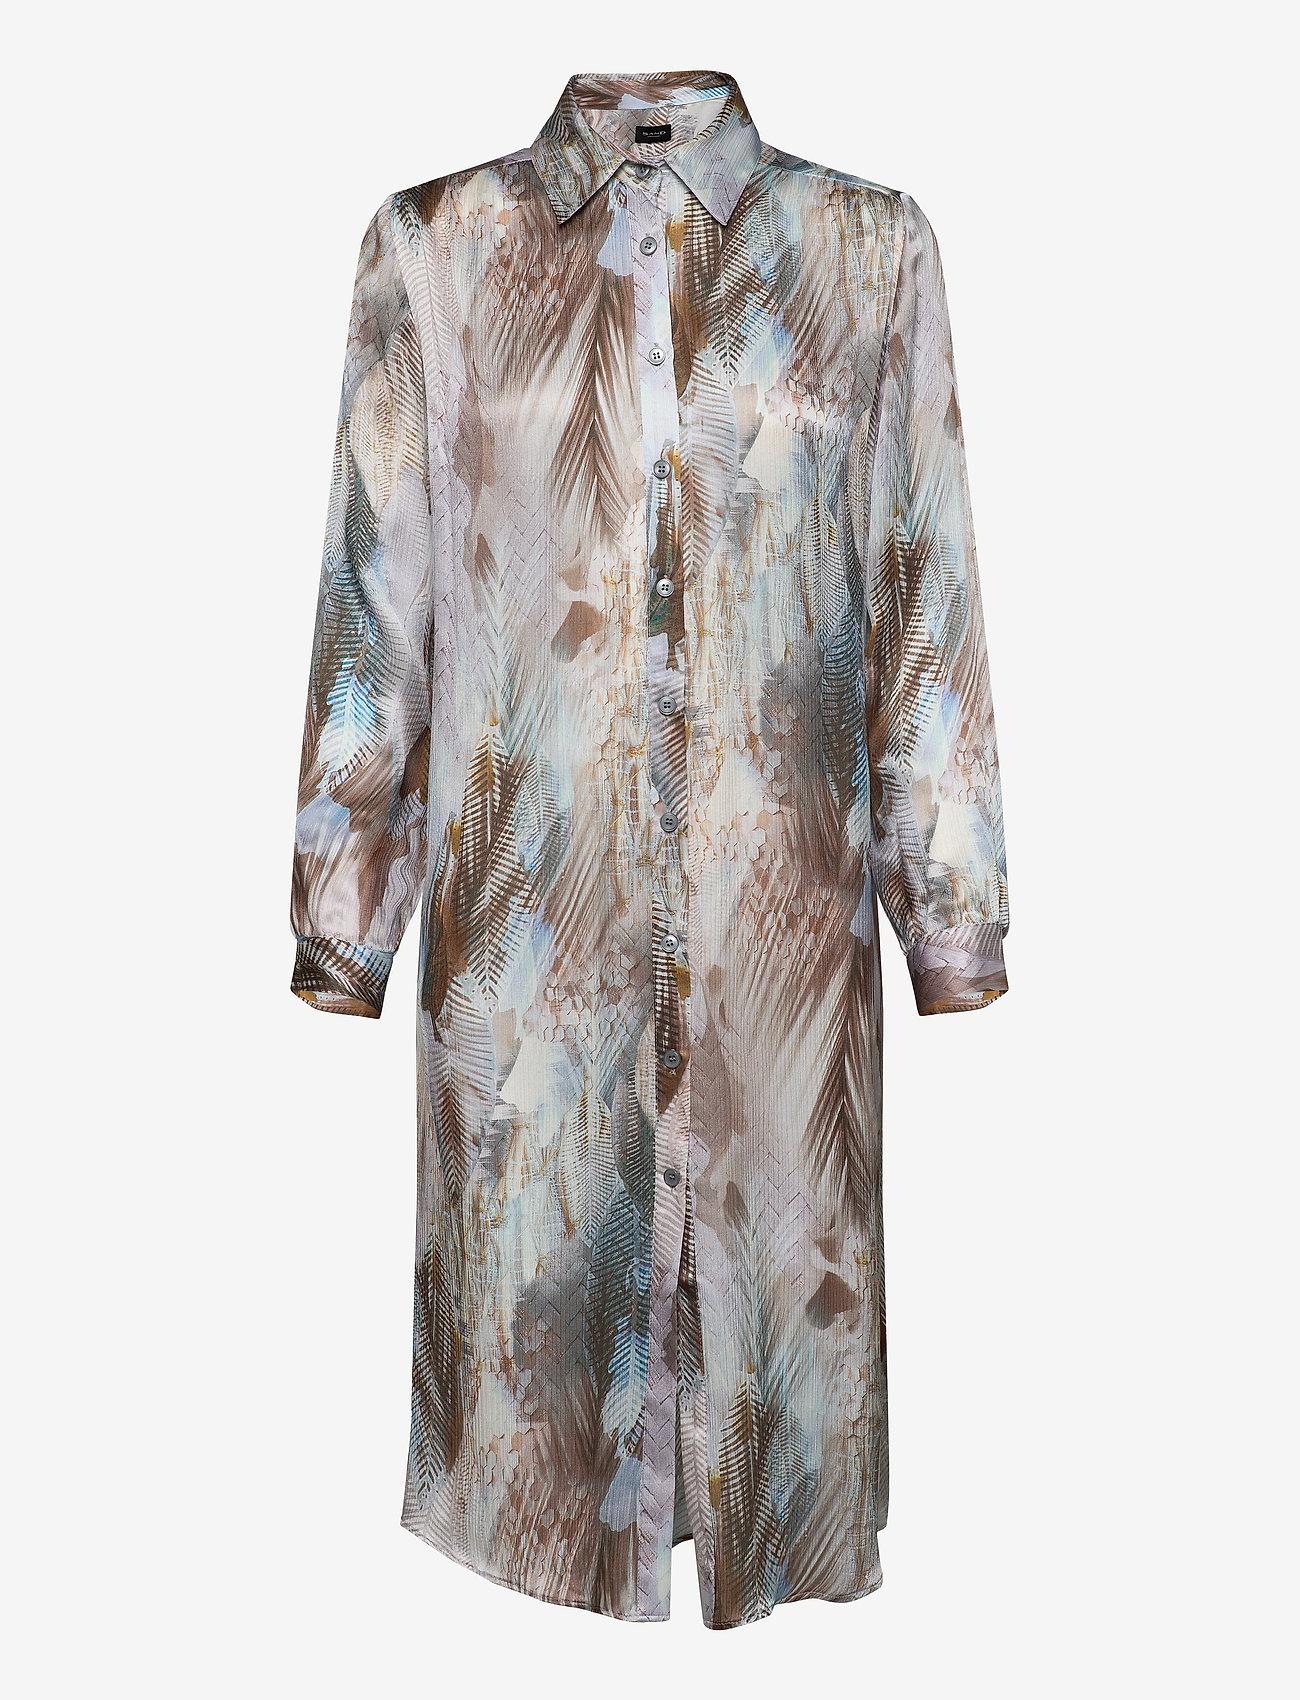 SAND - 3391 - Asia Dress - paitamekot - pattern - 0